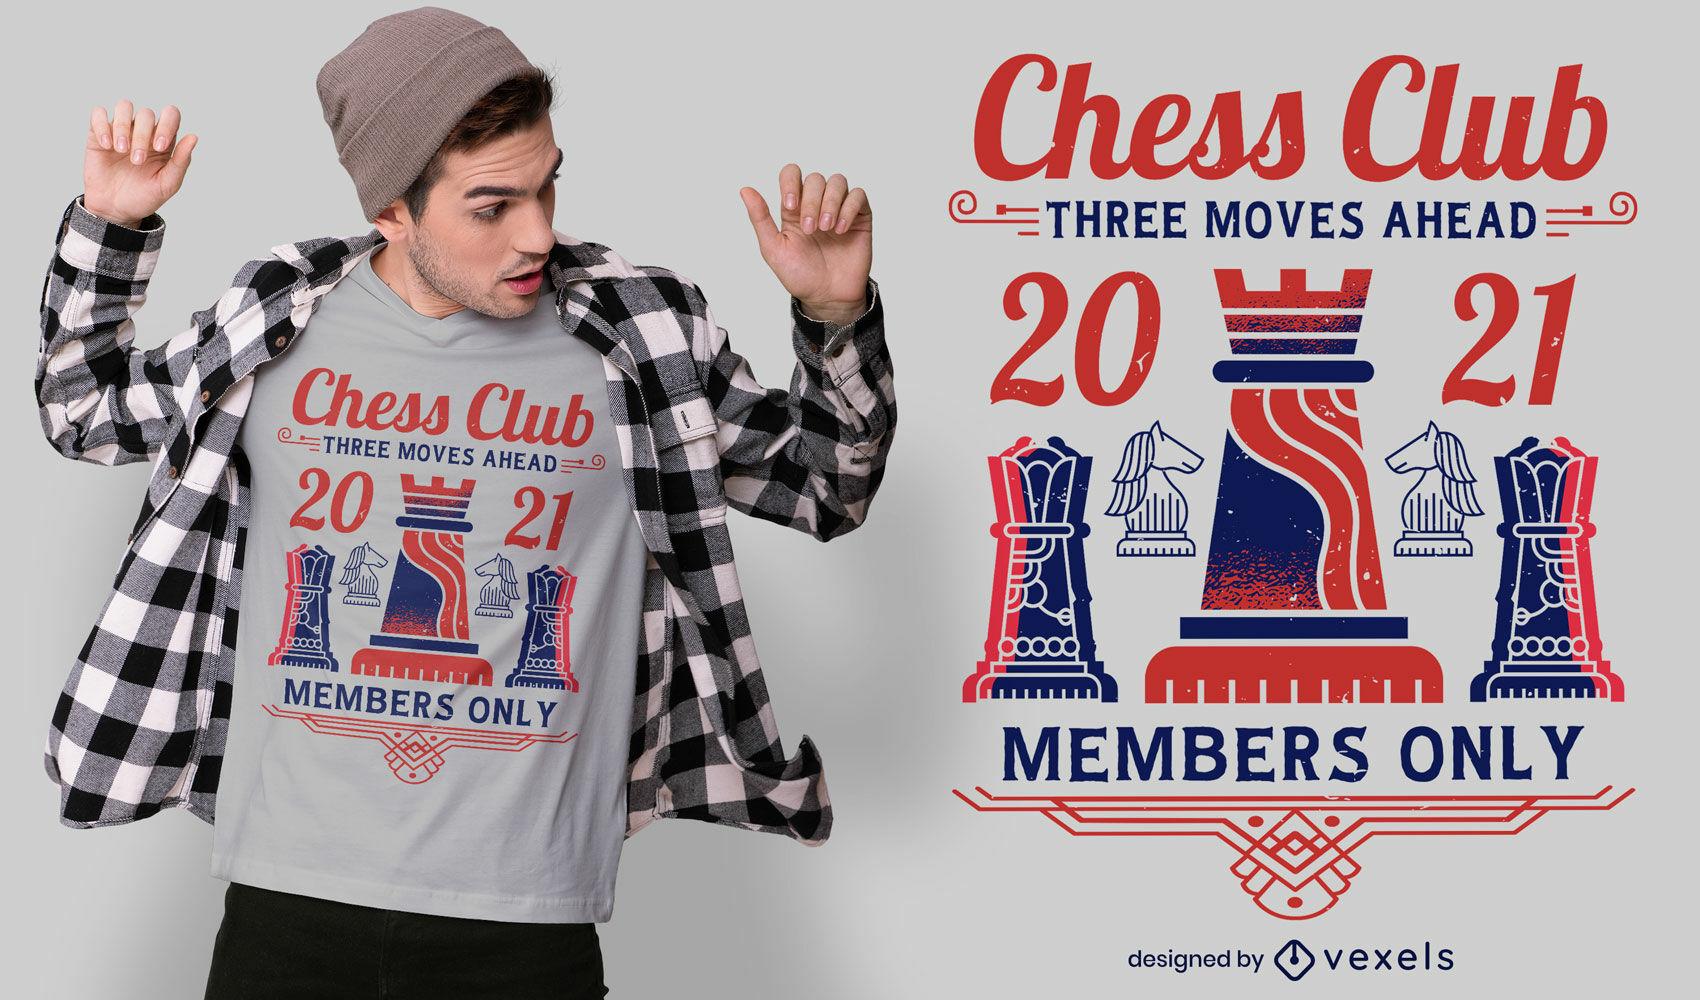 Dise?o de camiseta del club de ajedrez.